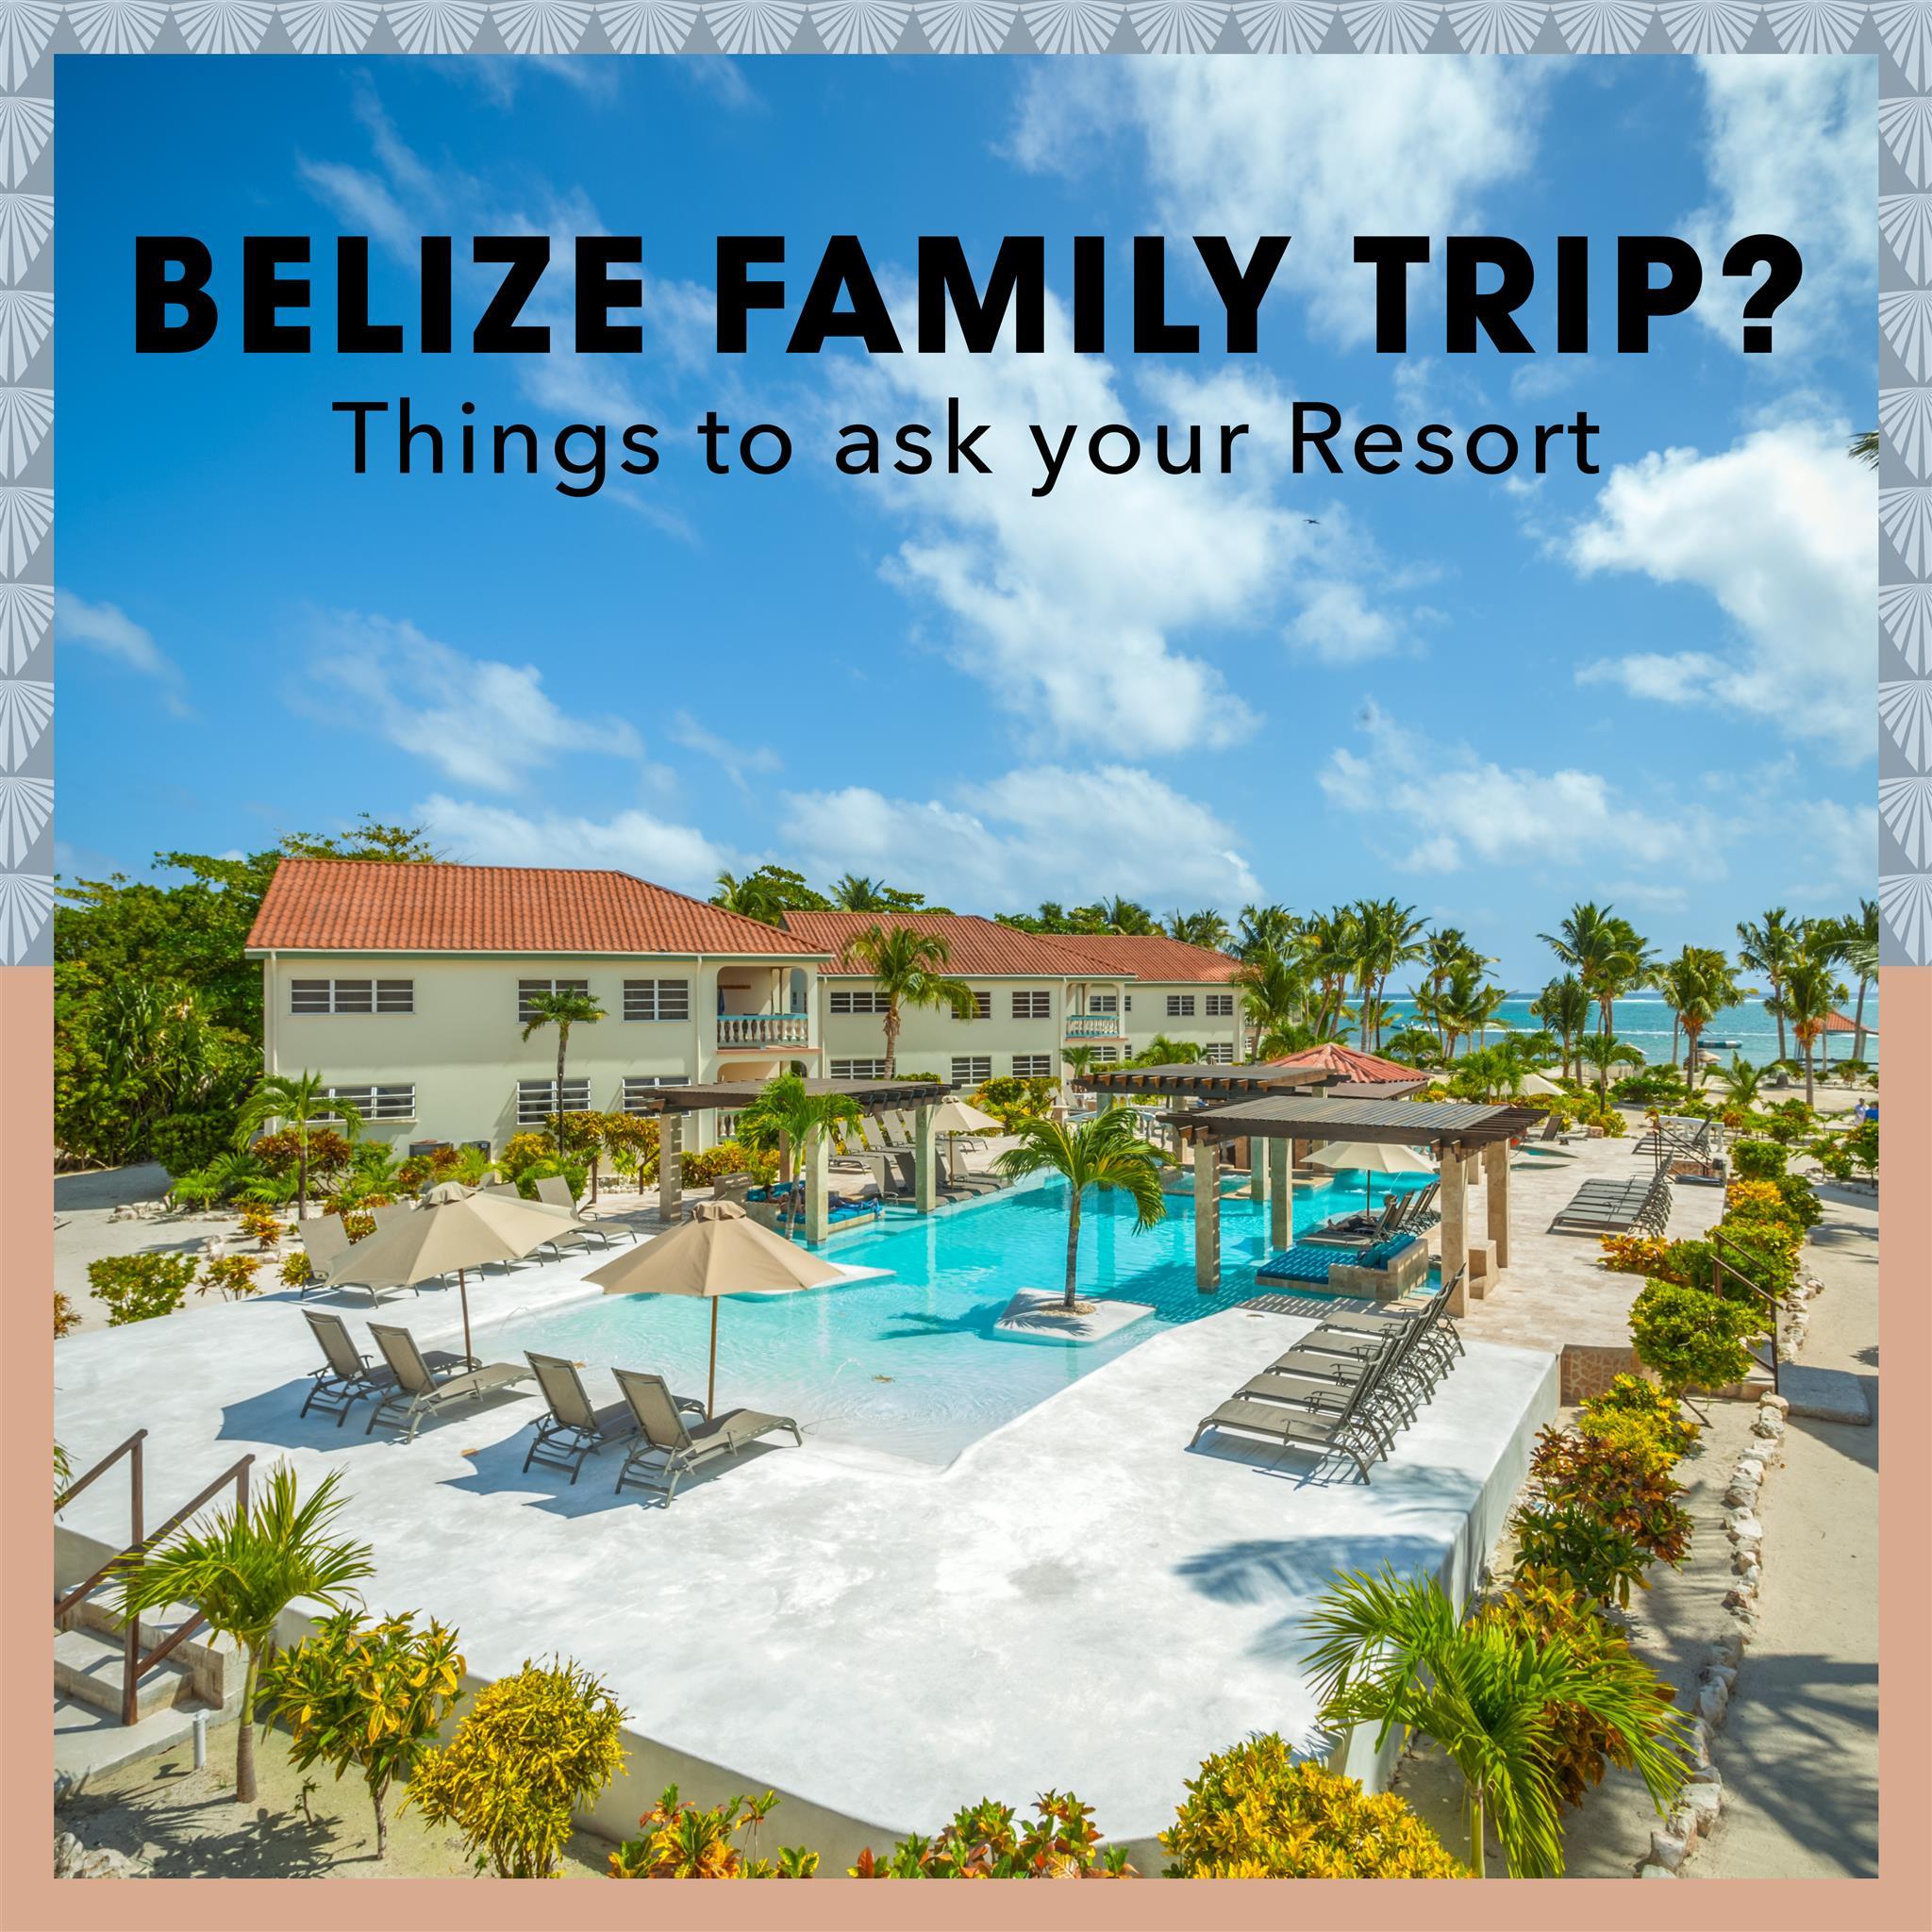 Belize Family Trip